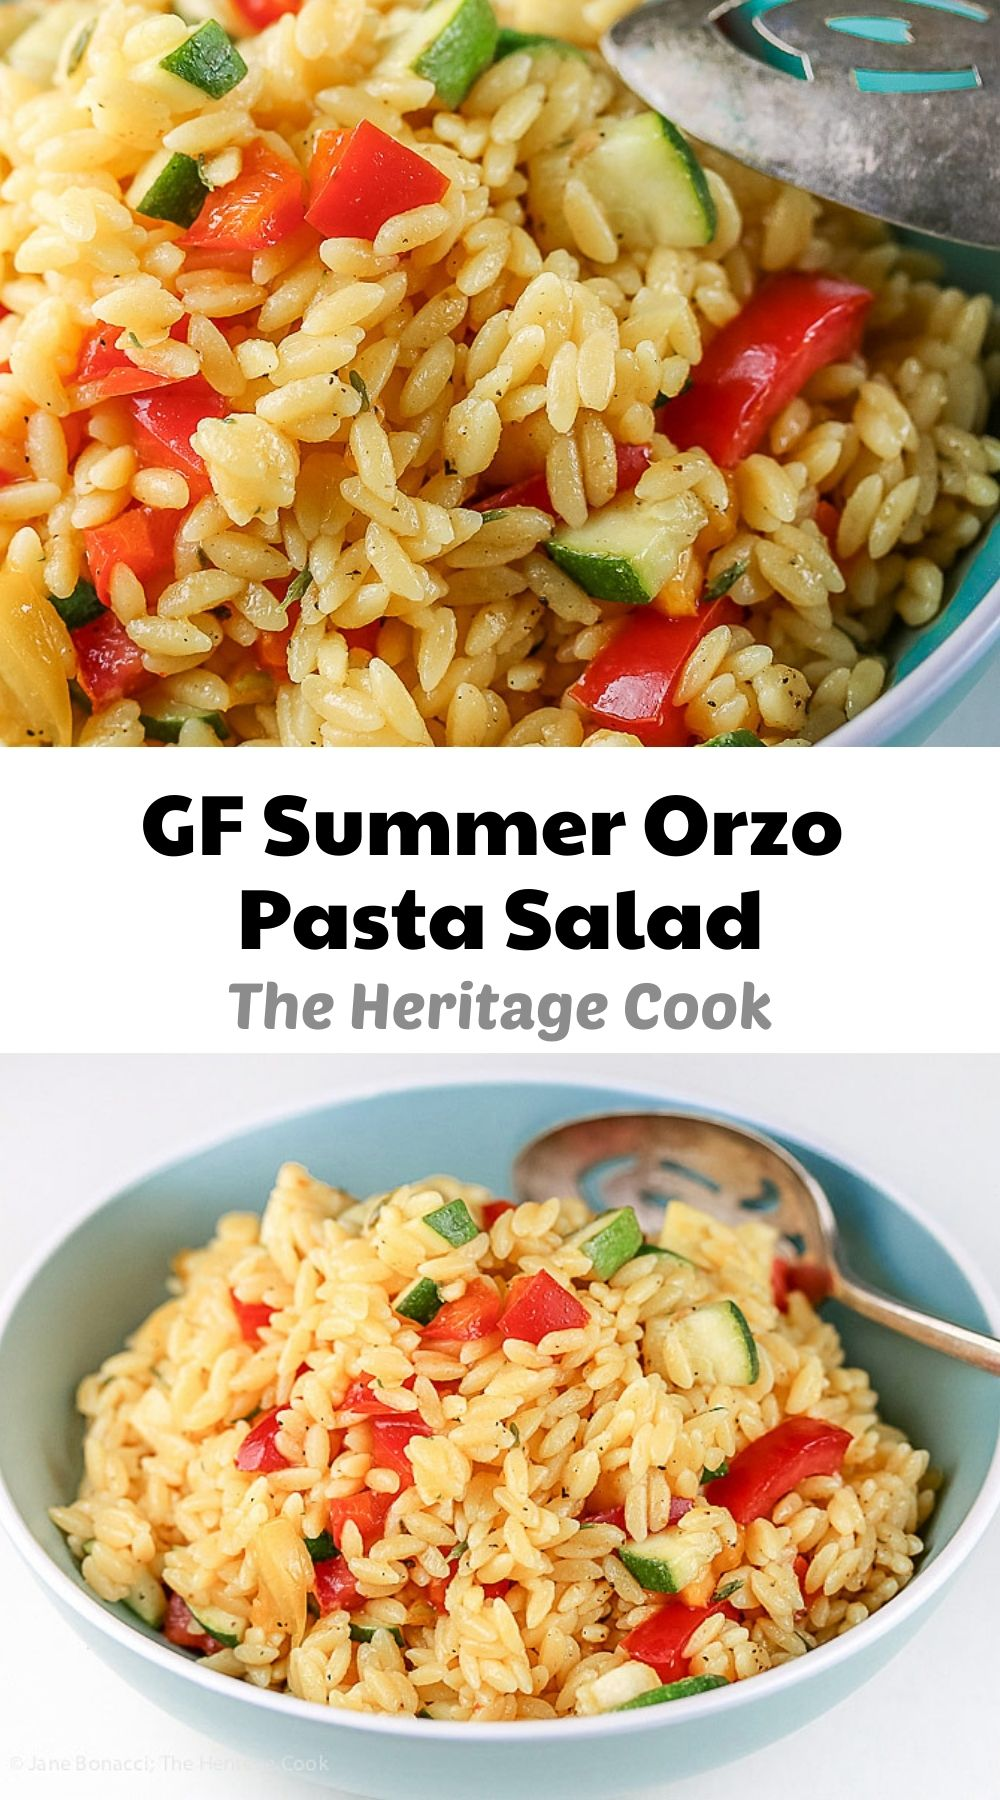 Gluten Free Summer Orzo Pasta Salad © 2021 Jane Bonacci, The Heritage Cook